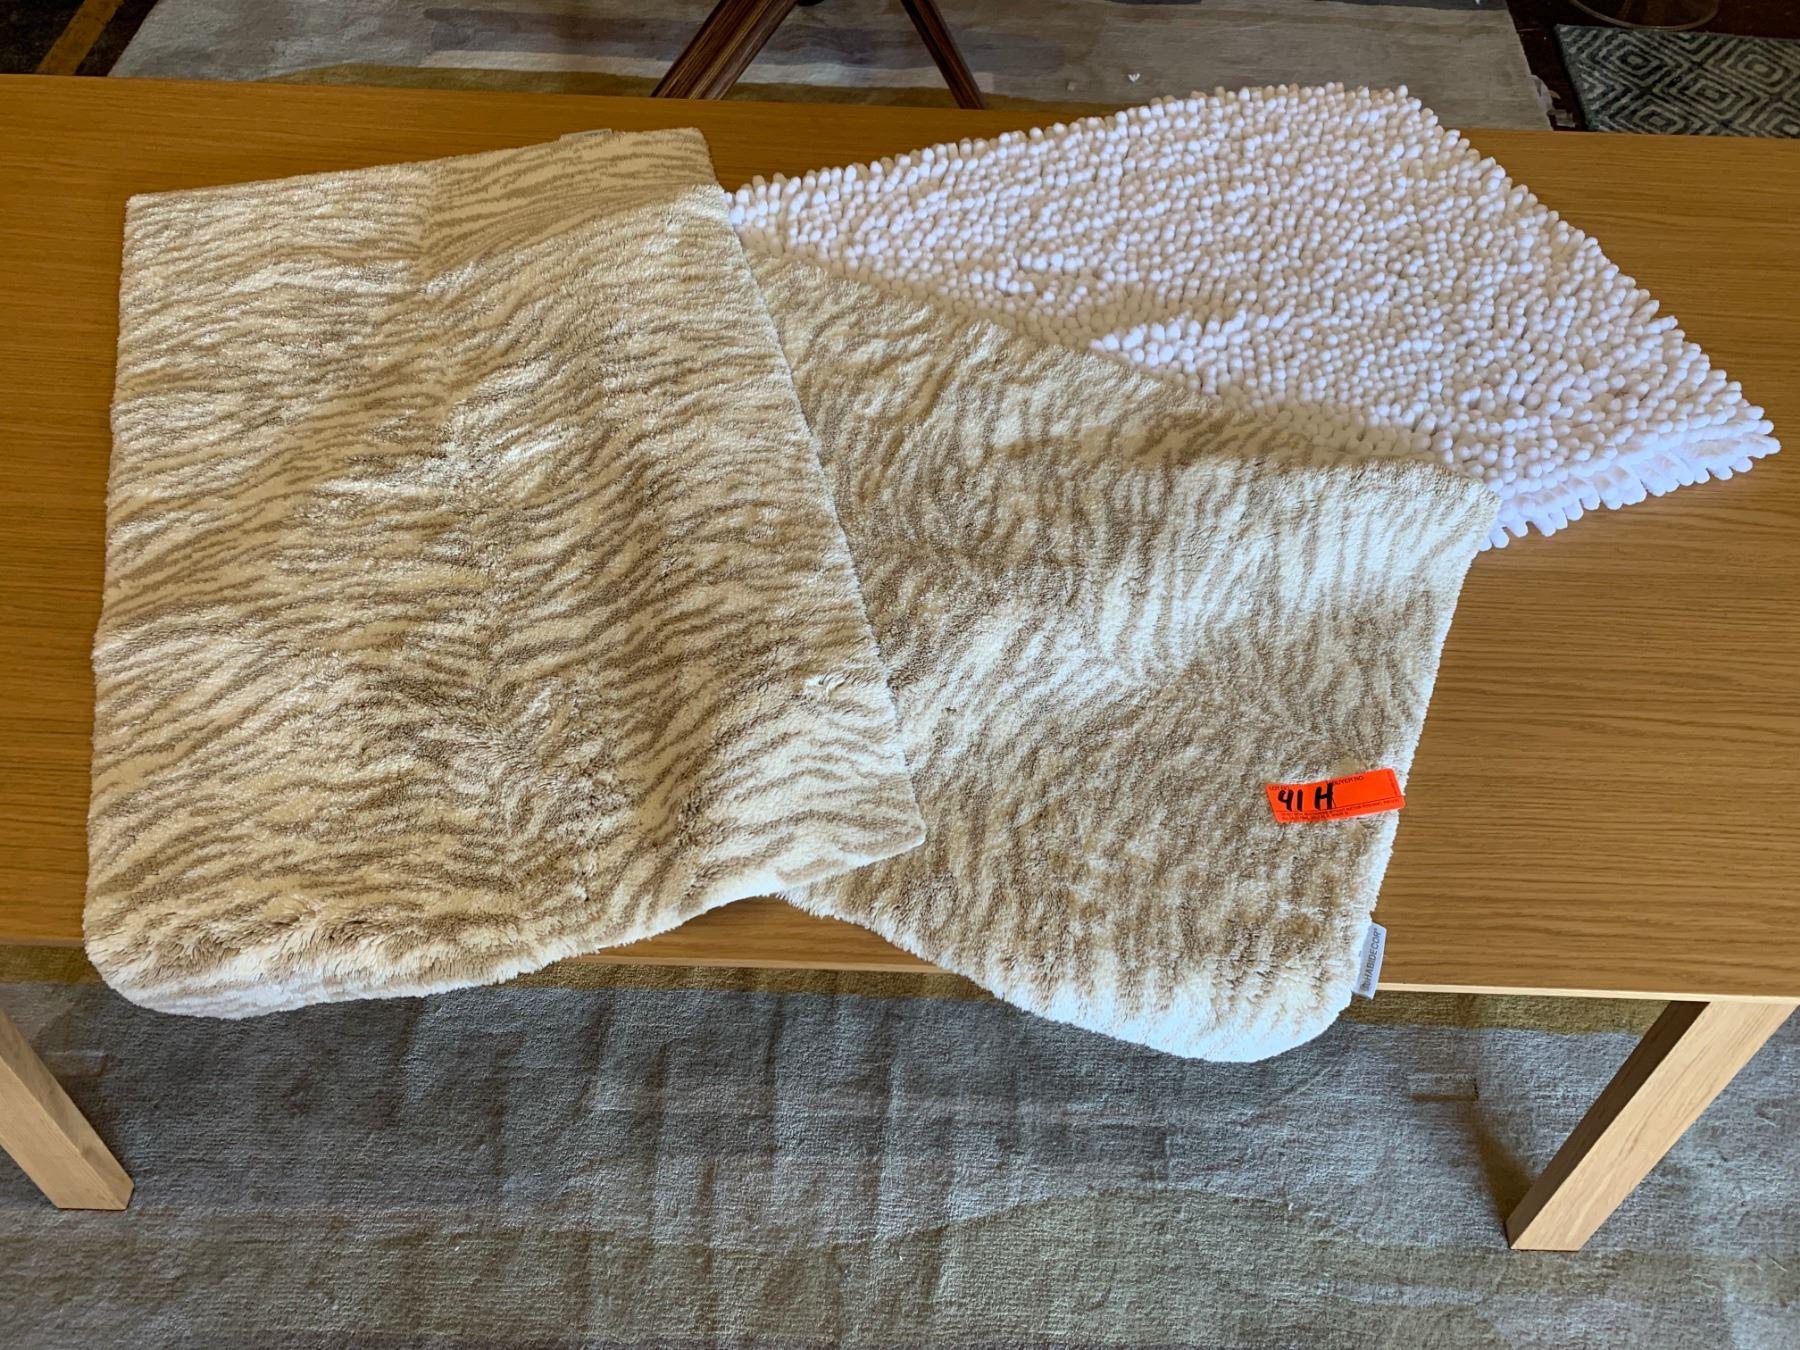 Picture of: 2 Habidecor Animal Print Bath Rugs 1 Plush White Pompom Bath Rug Oahu Auctions